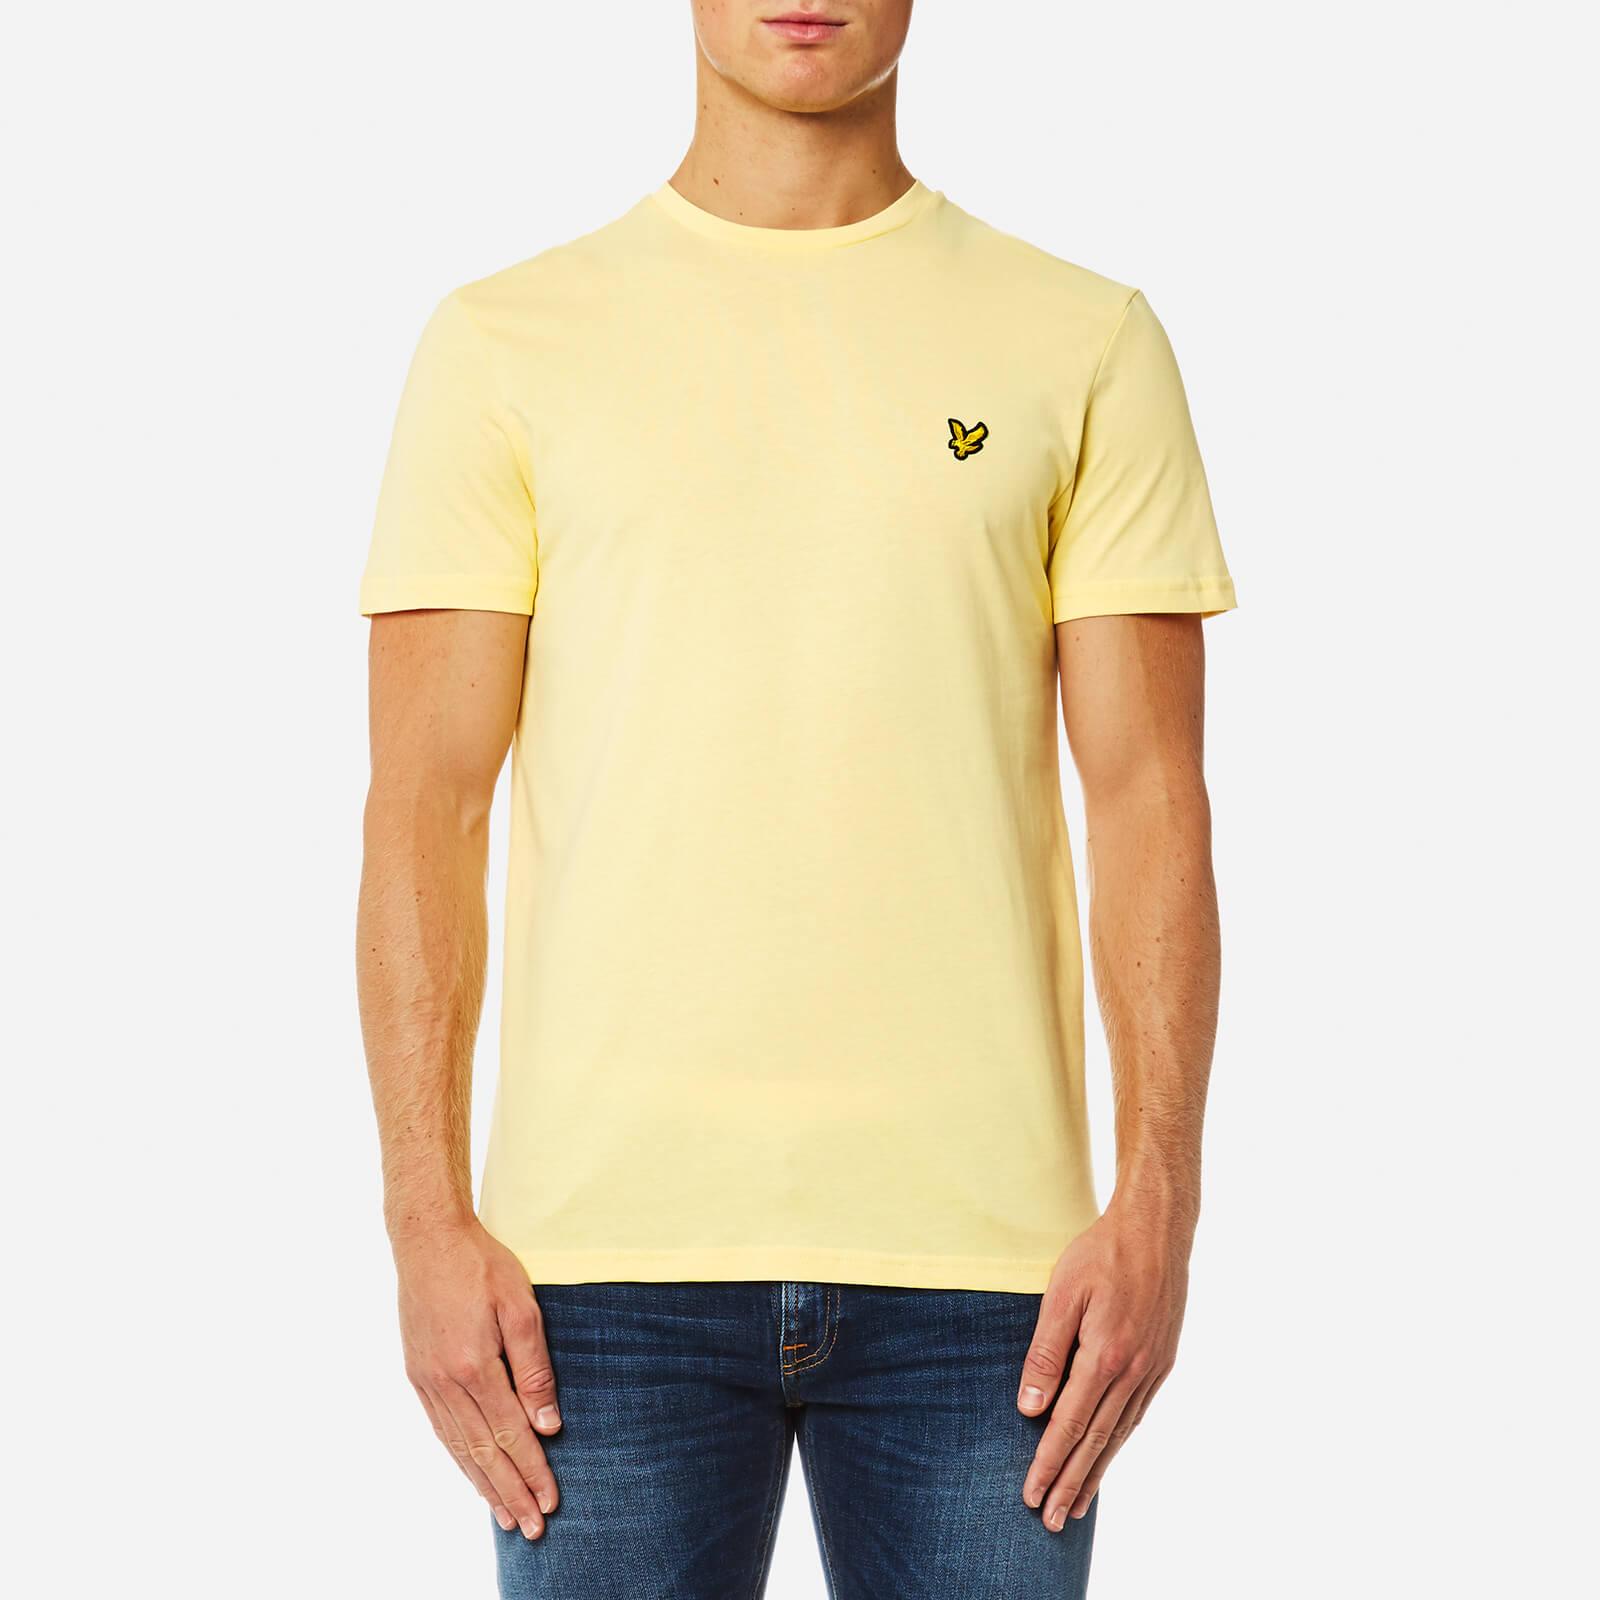 2f030a3ff8049 Lyle & Scott Men's Crew Neck T-Shirt - Pale Yellow Clothing | TheHut.com